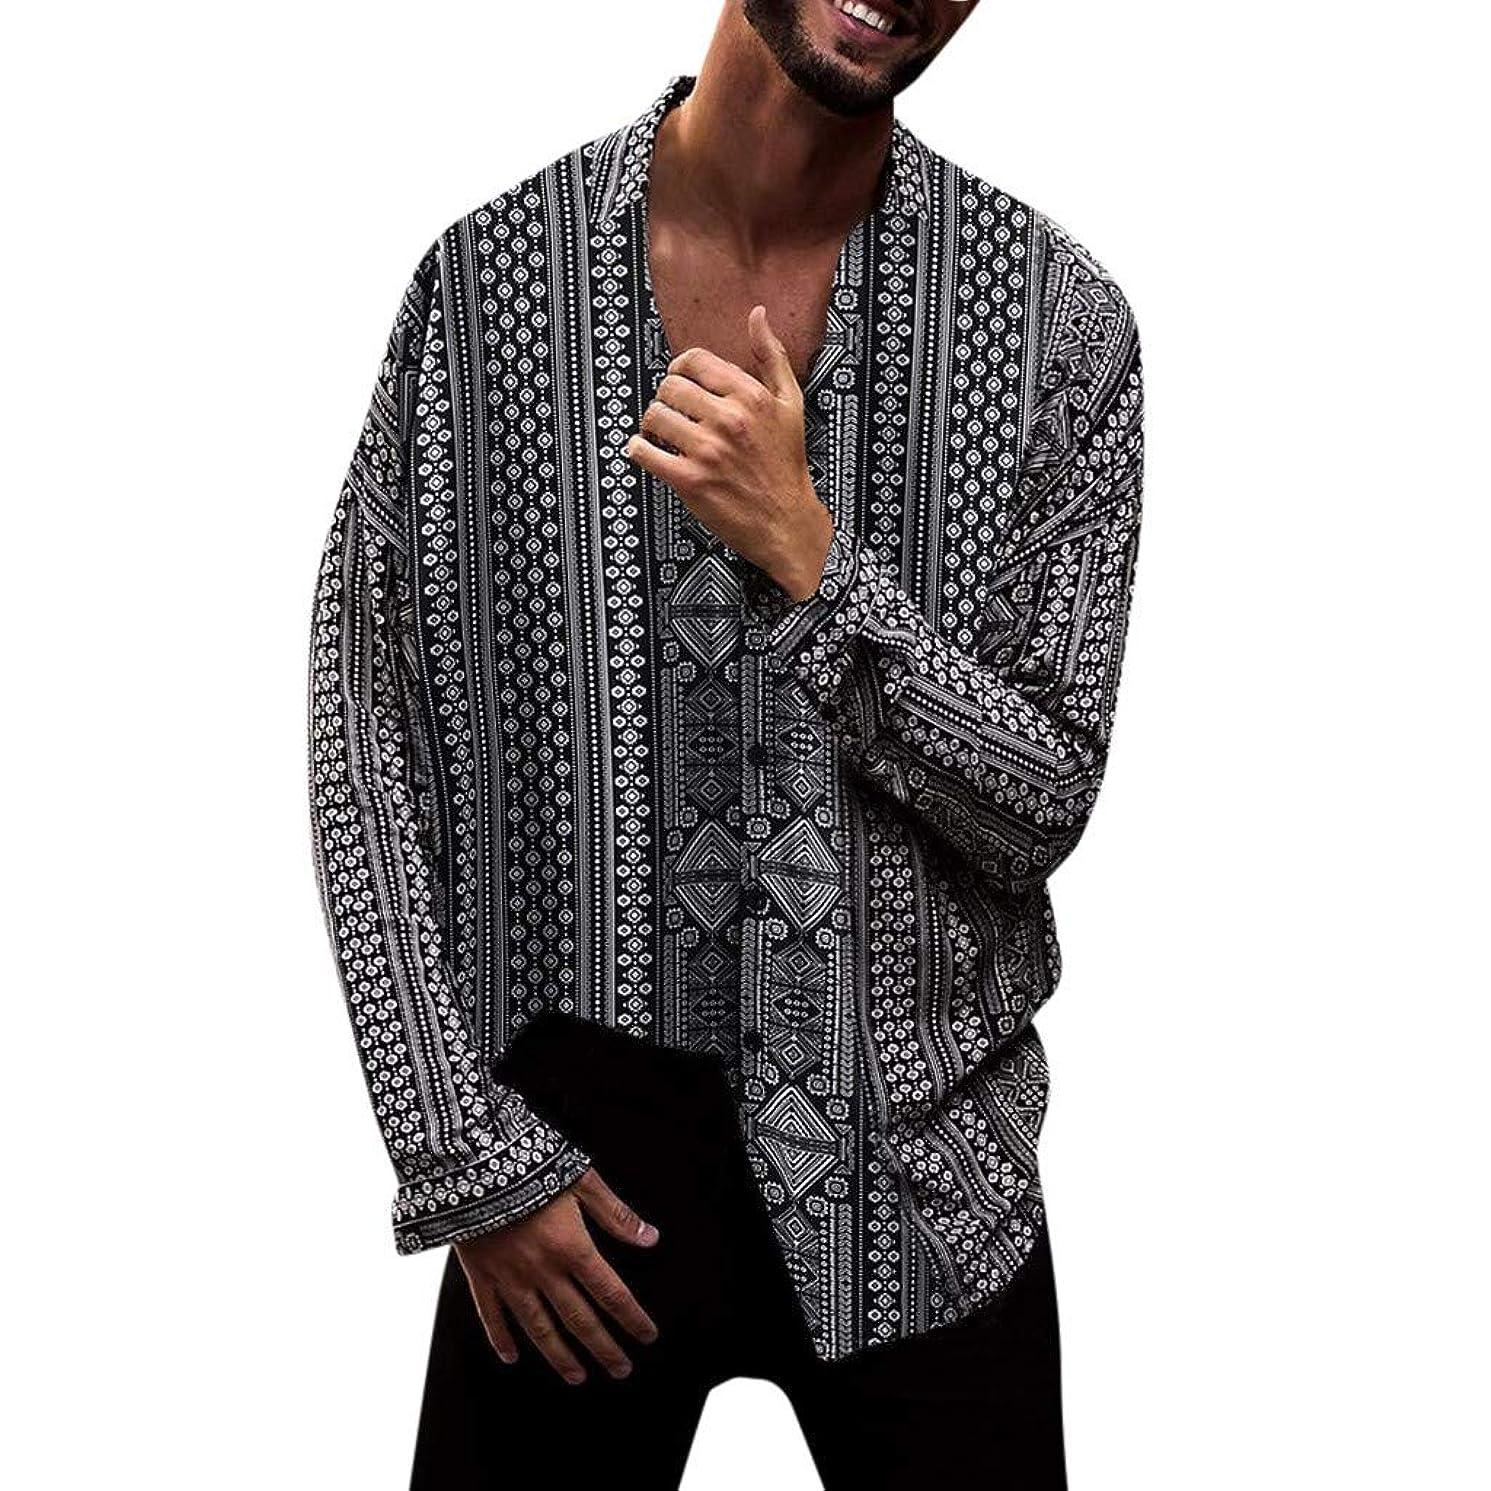 Swyss Men's Casual Shirts Long -Sleeve Lightweight Button Down Shirt Ethnic Style Fashion Print Beach T Shirts Tops Blouse